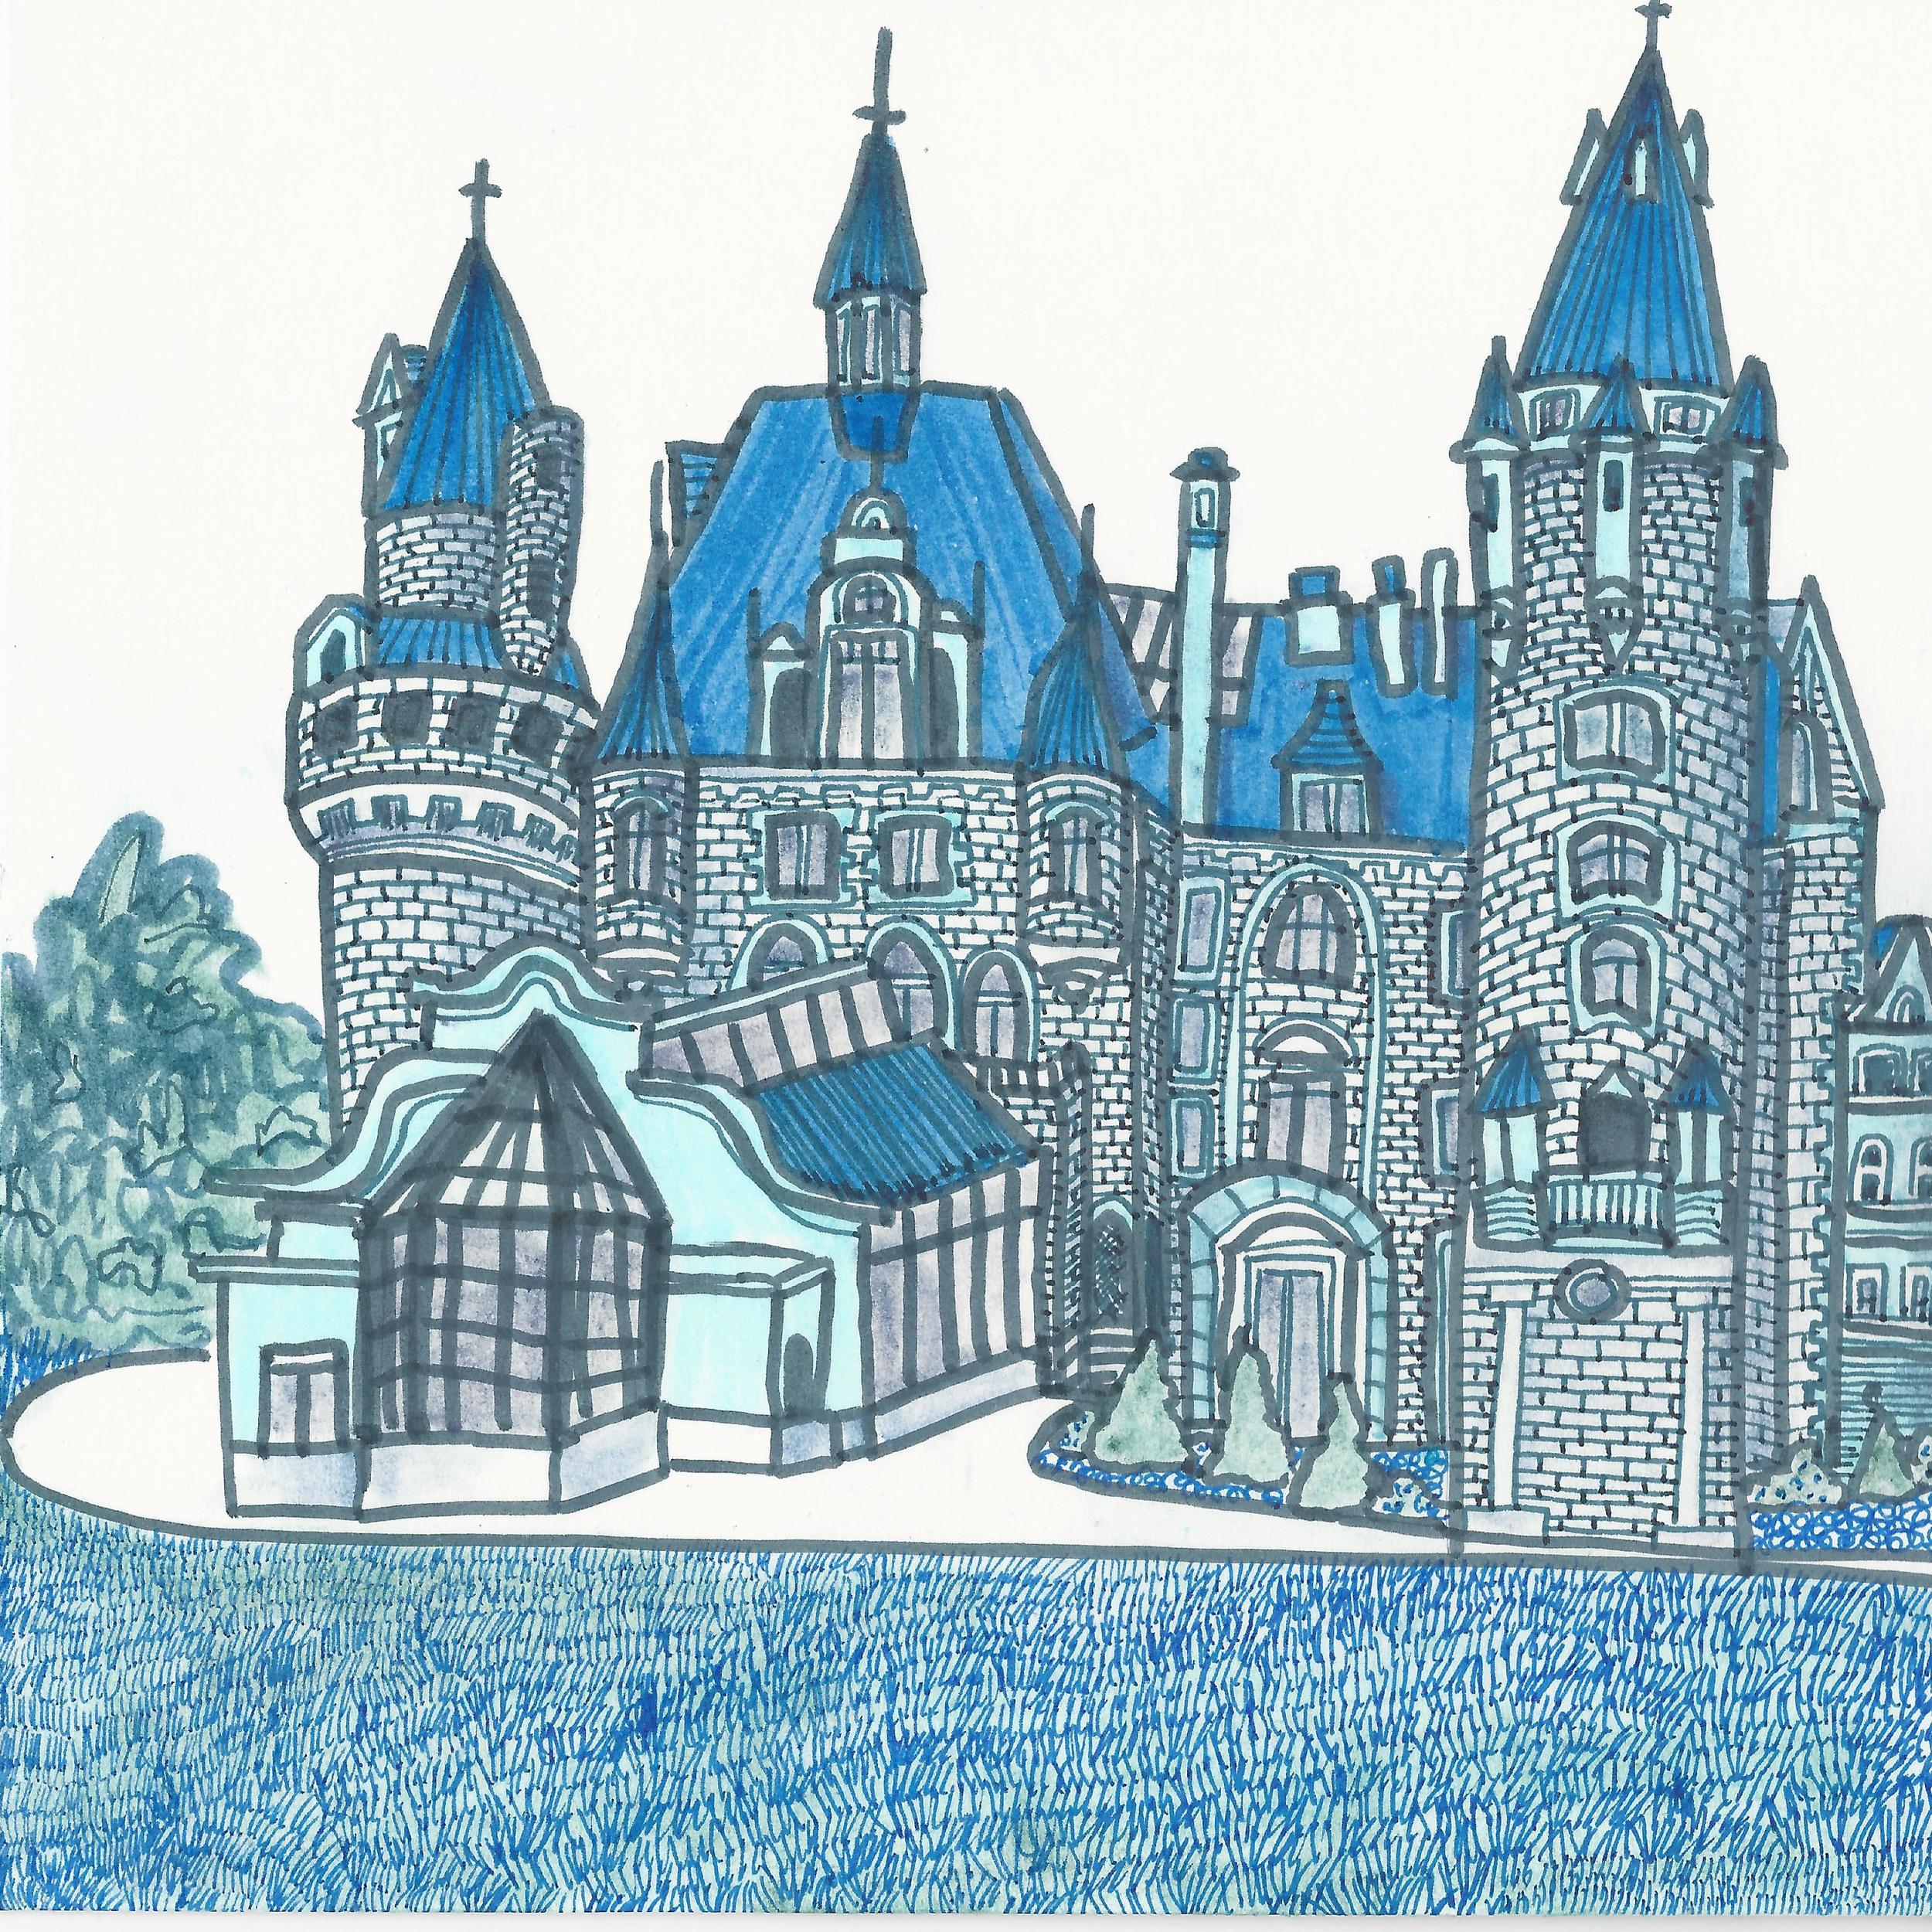 18-100 Moszna Castle, Poland.jpg